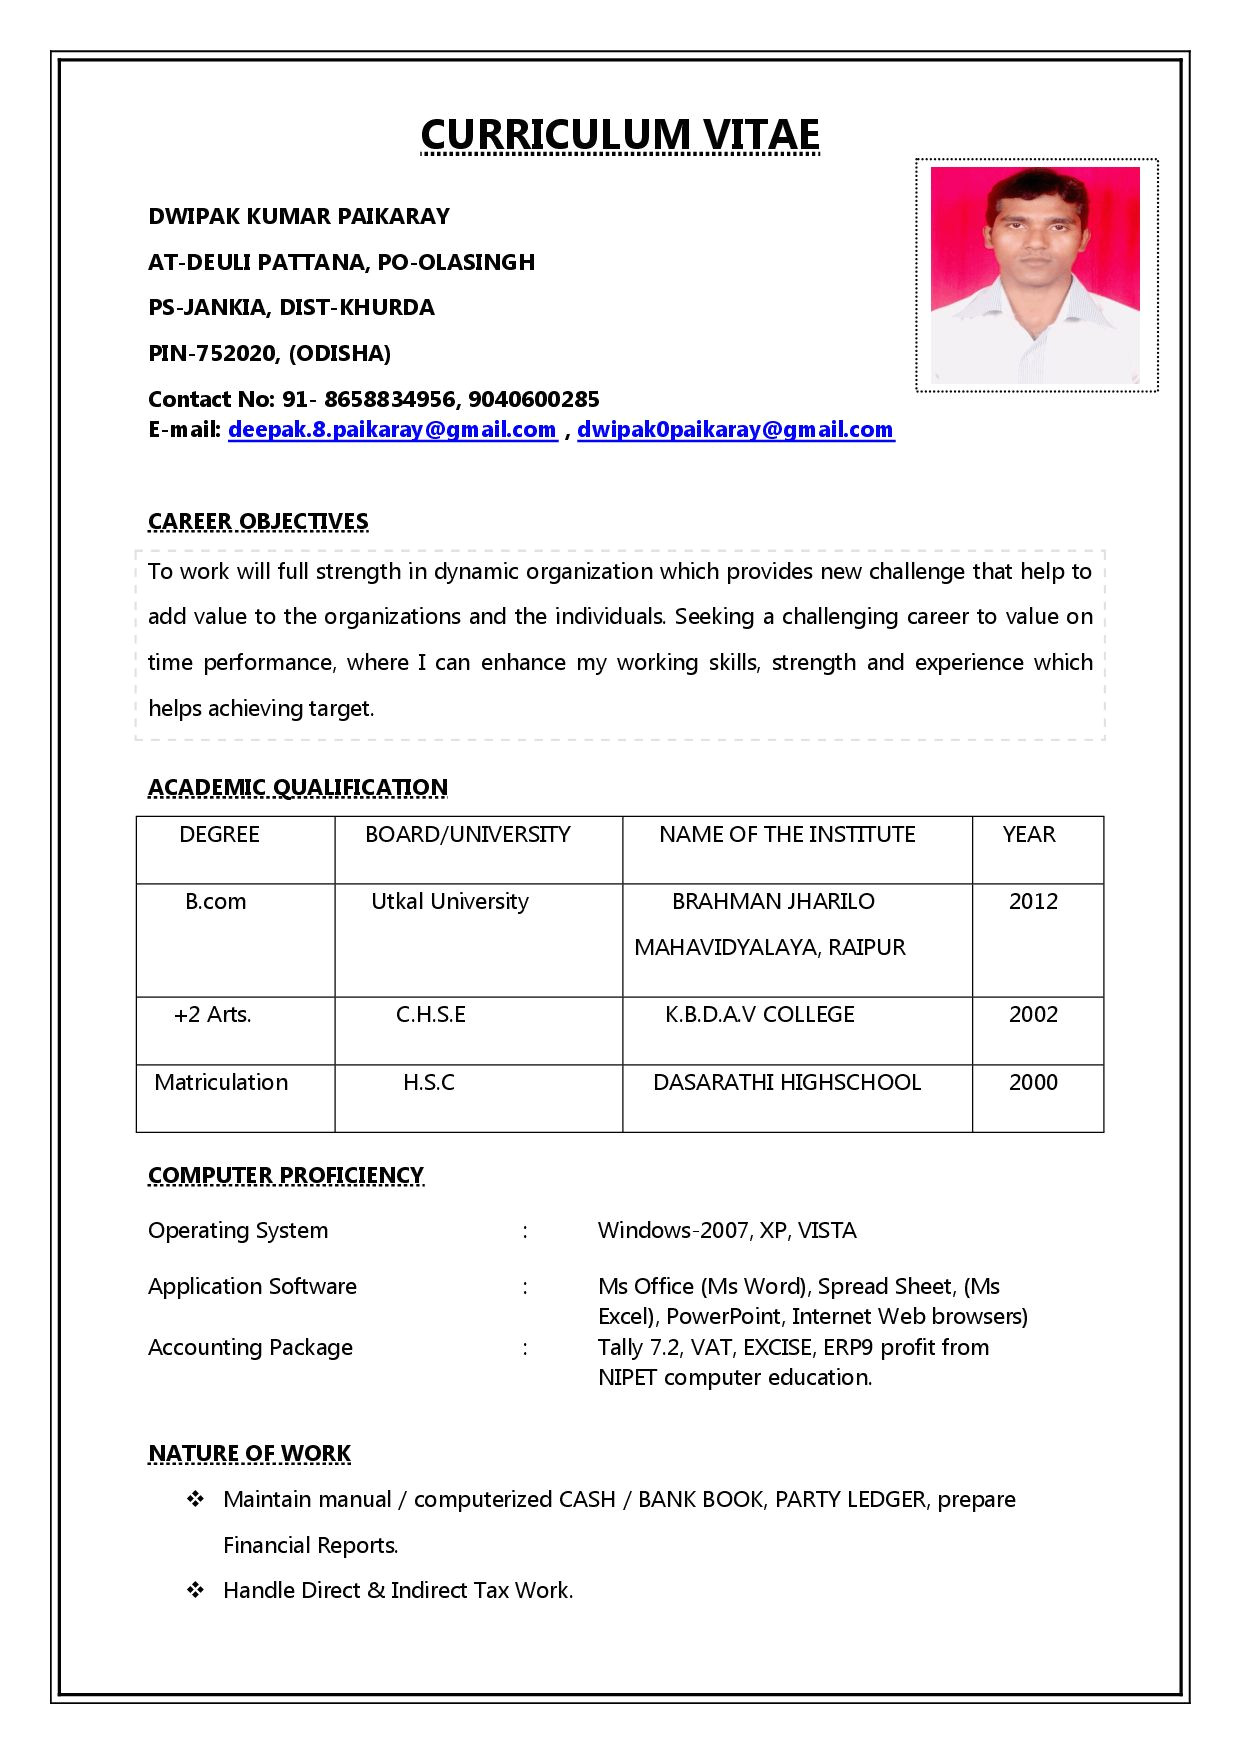 Resume format Examples for Job Job Job Resume format New Resume format Job Resume